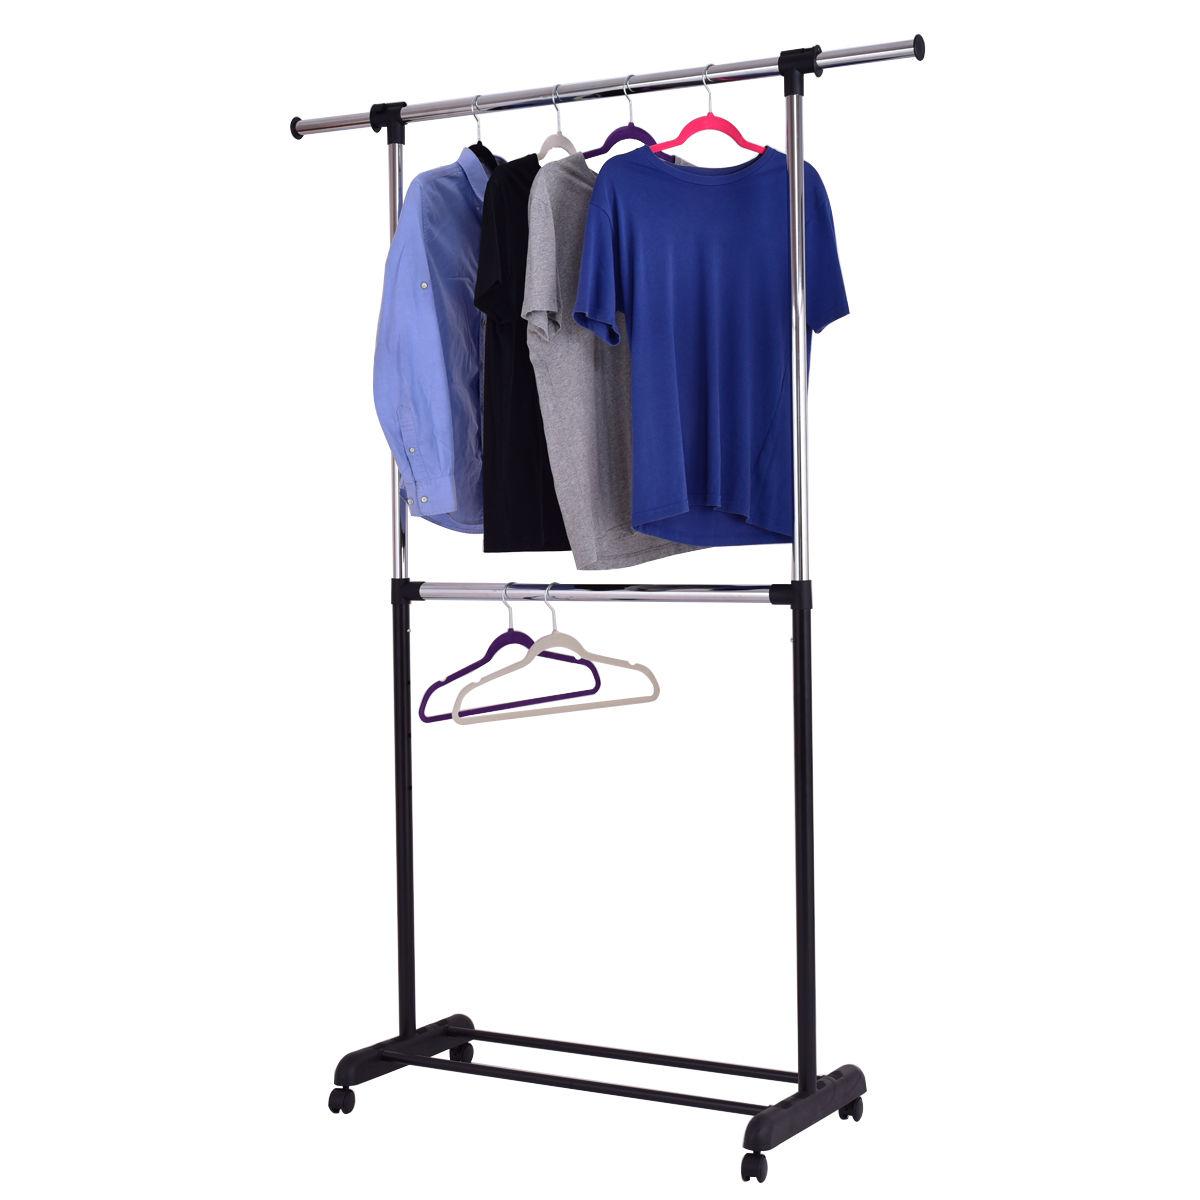 Zimtown Ajustble Portable Rolling Clothes Rack Single Hanging Garment Bar Heavy Duty Hanger